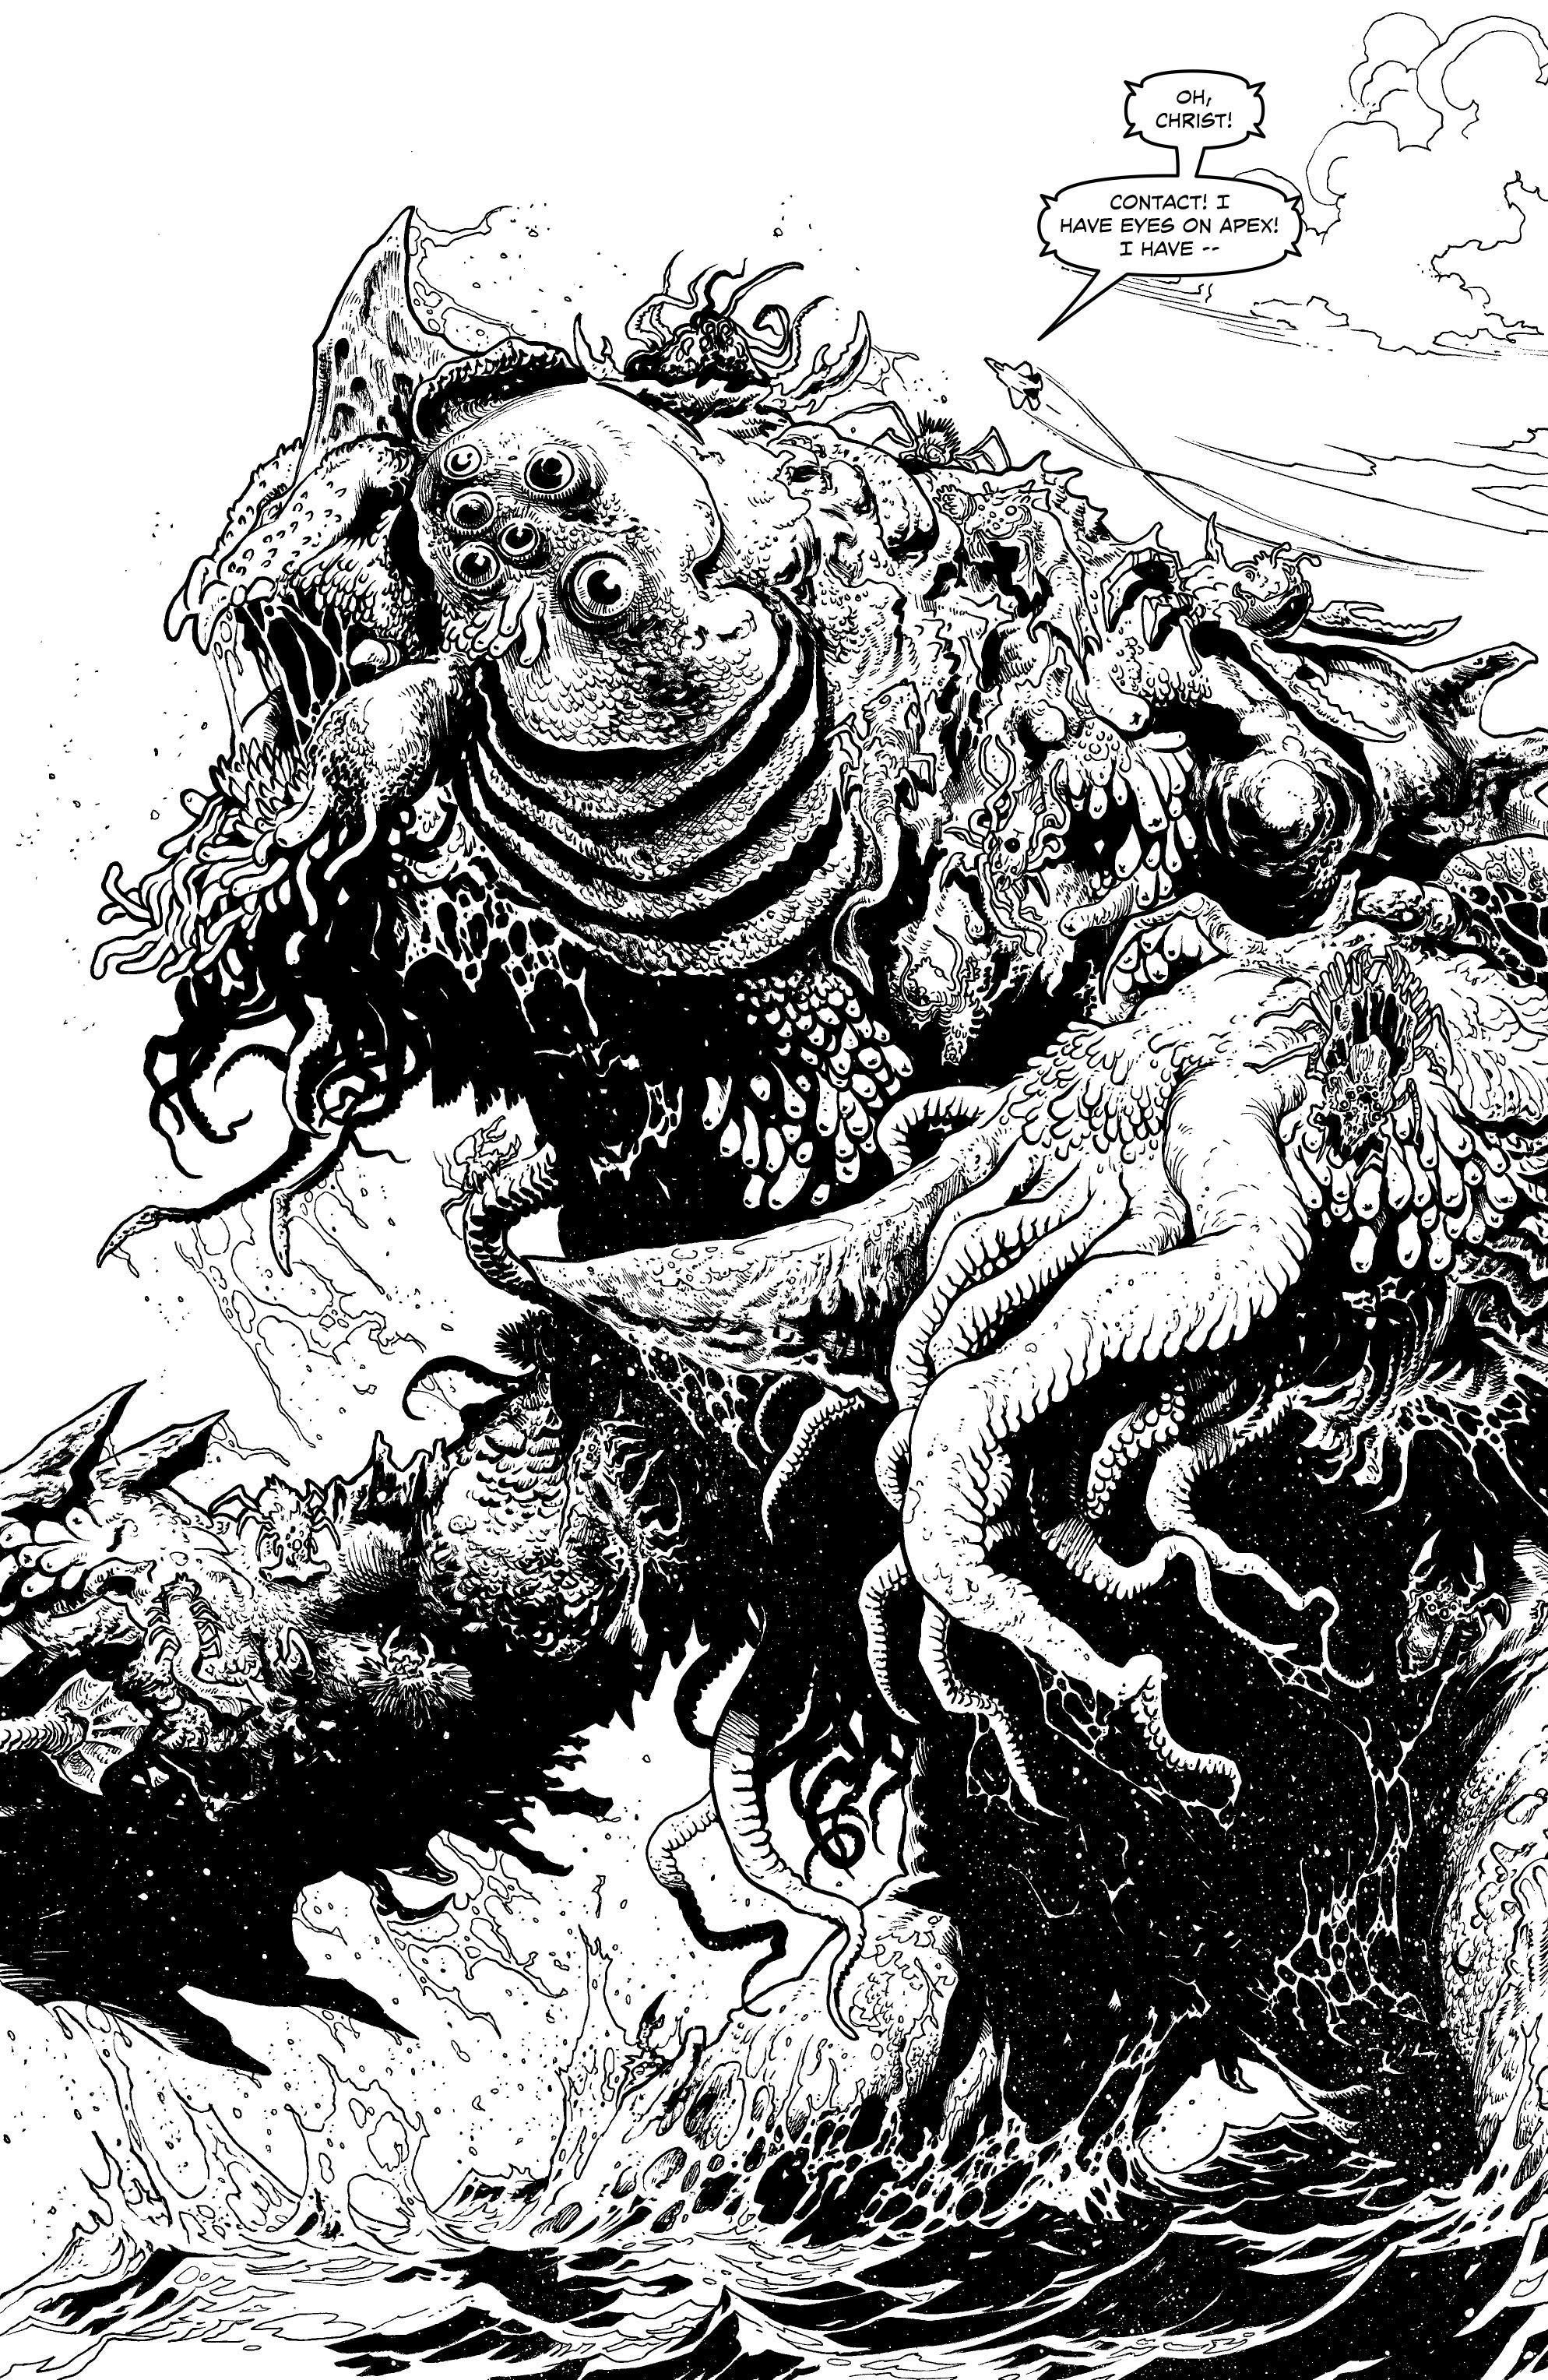 Read online Alan Moore's Cinema Purgatorio comic -  Issue #1 - 48